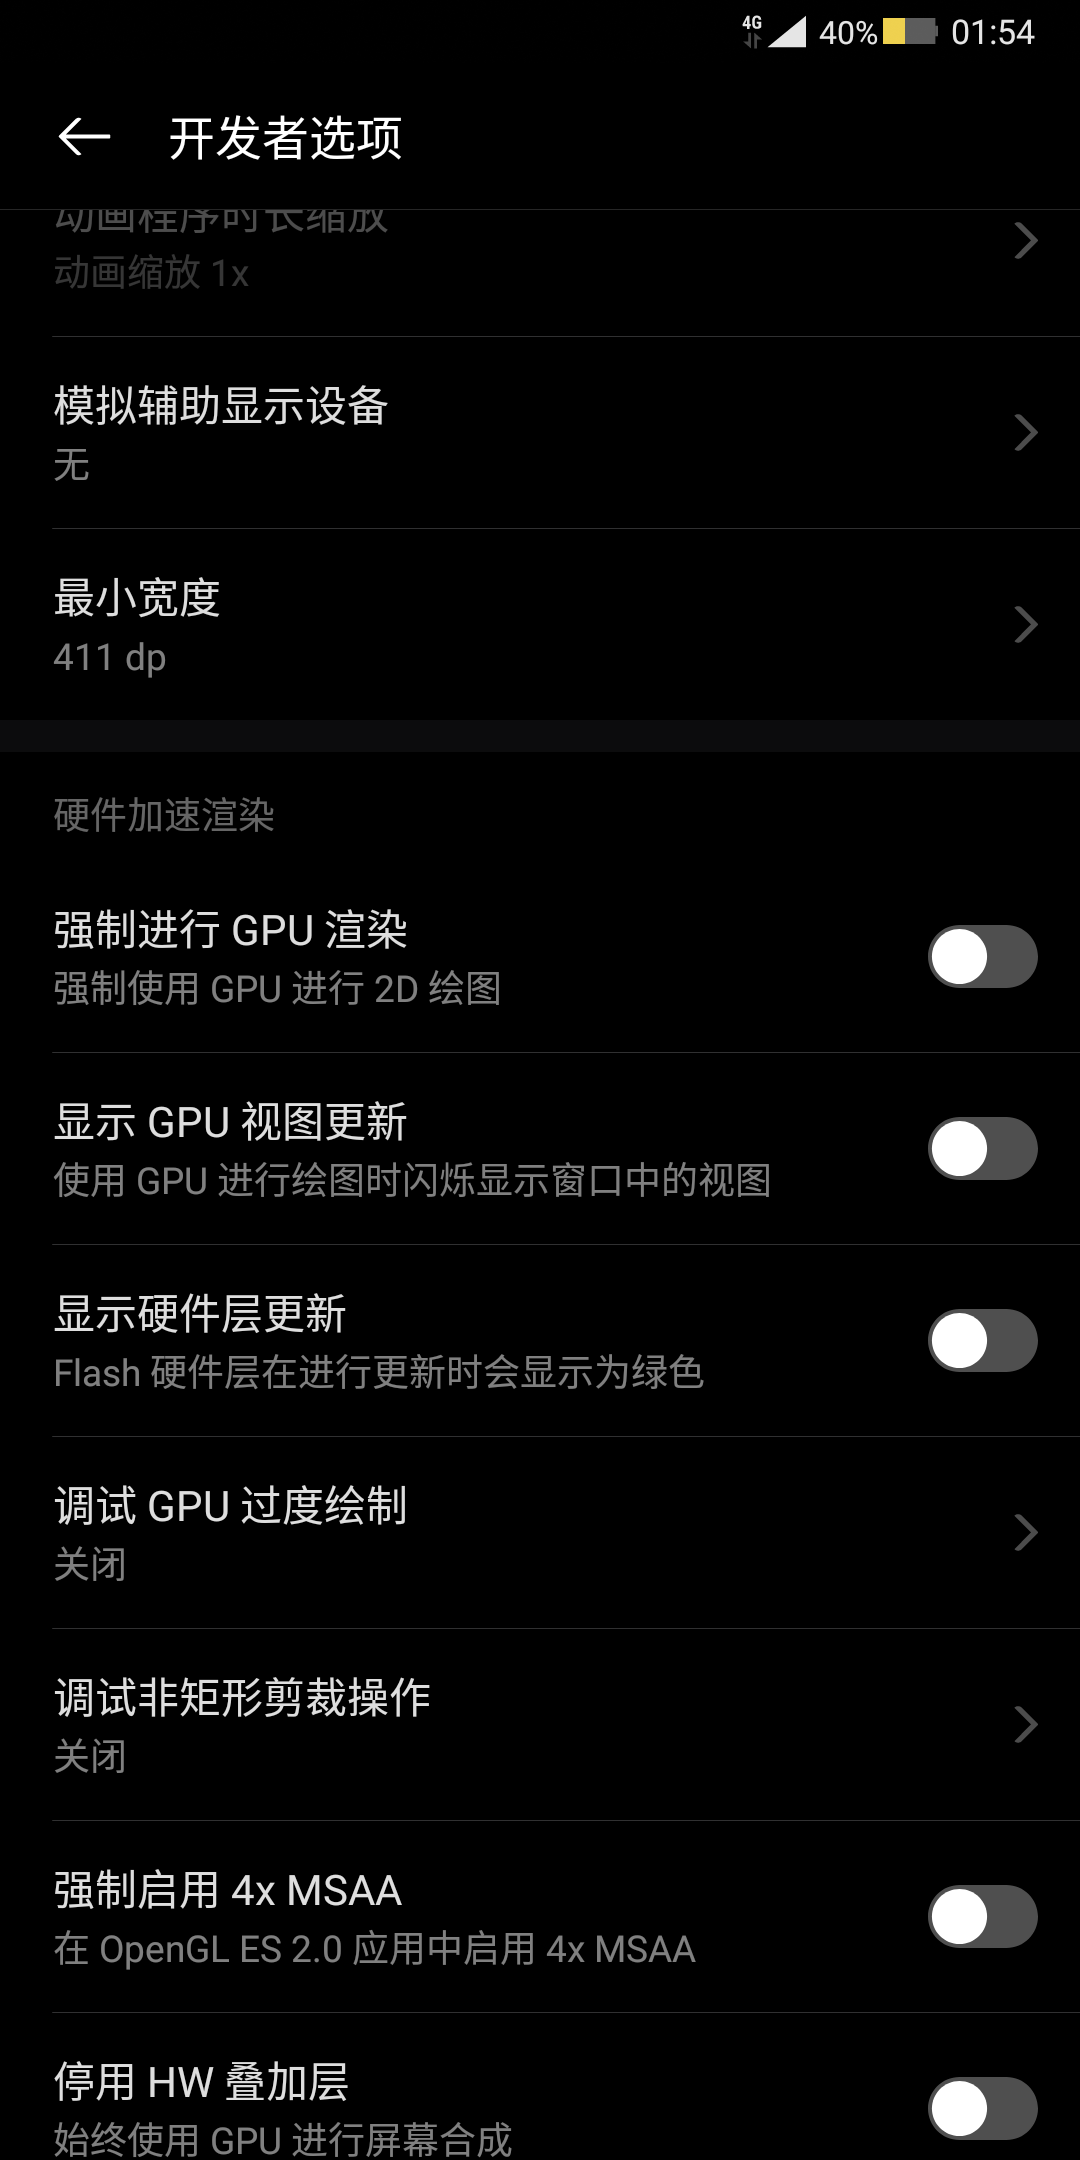 Screenshot_2019-07-15-01-54-07-340_com.android.se.png